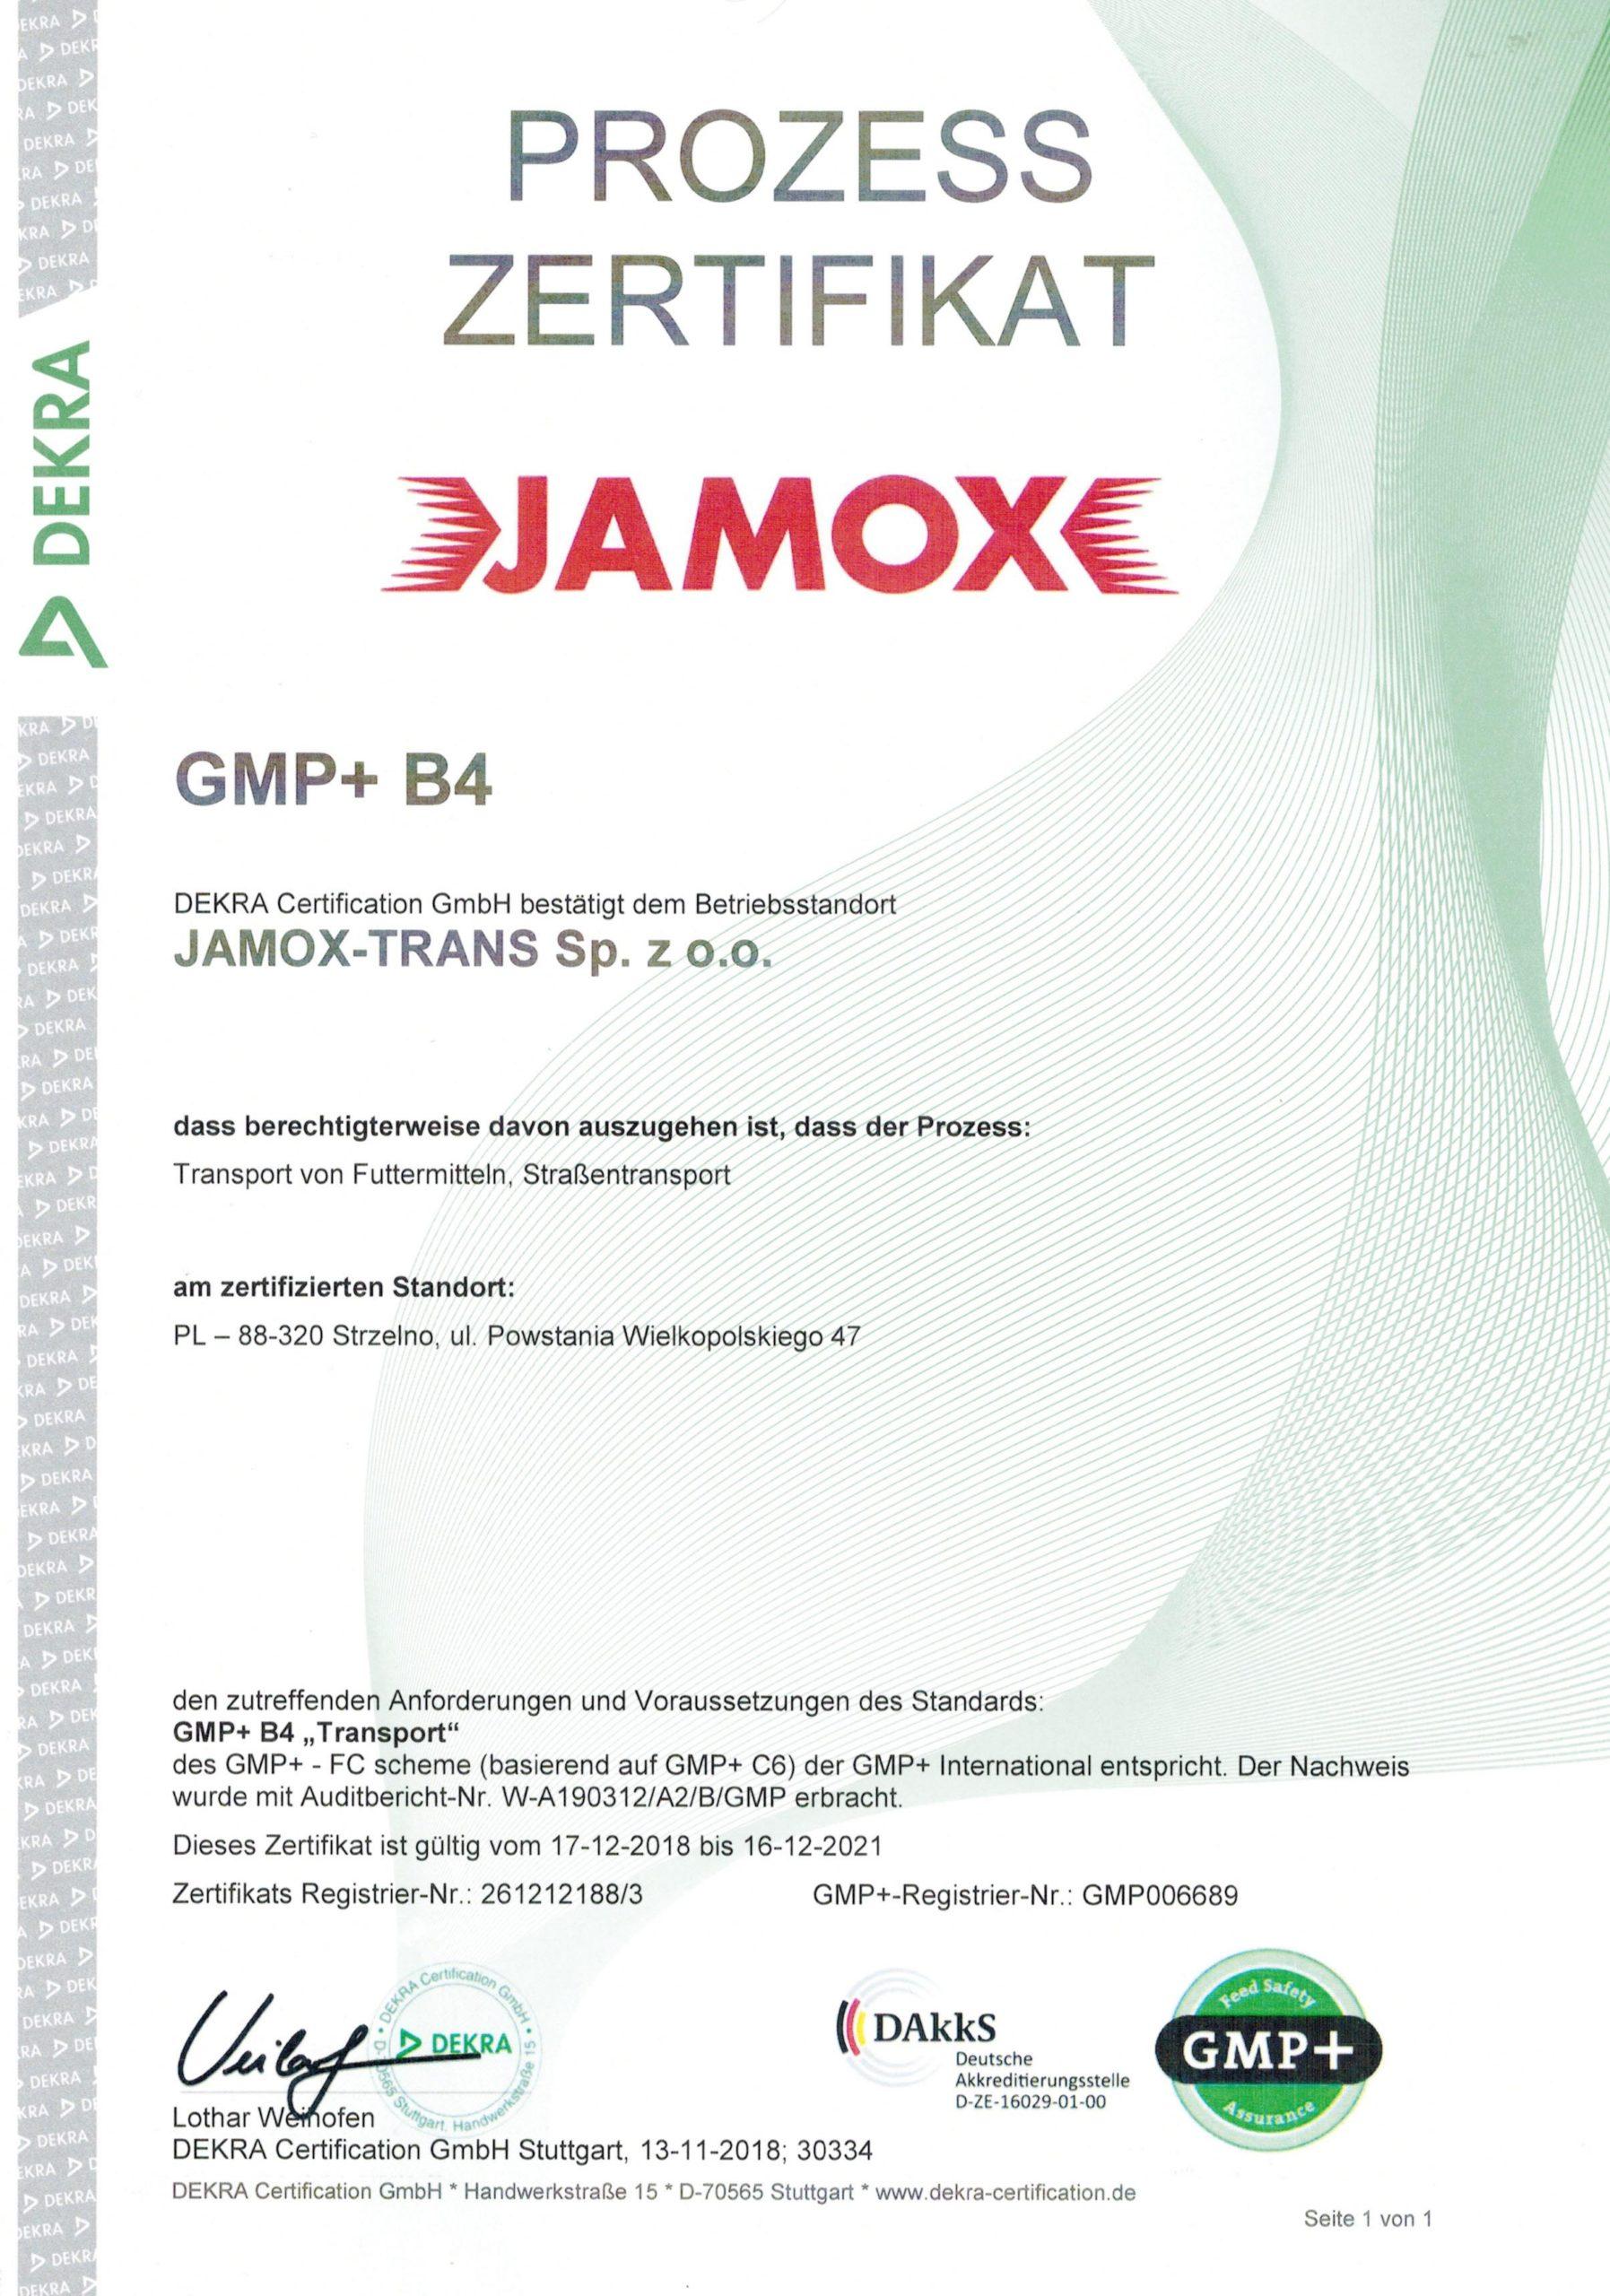 Jamox certyfikat GMP +